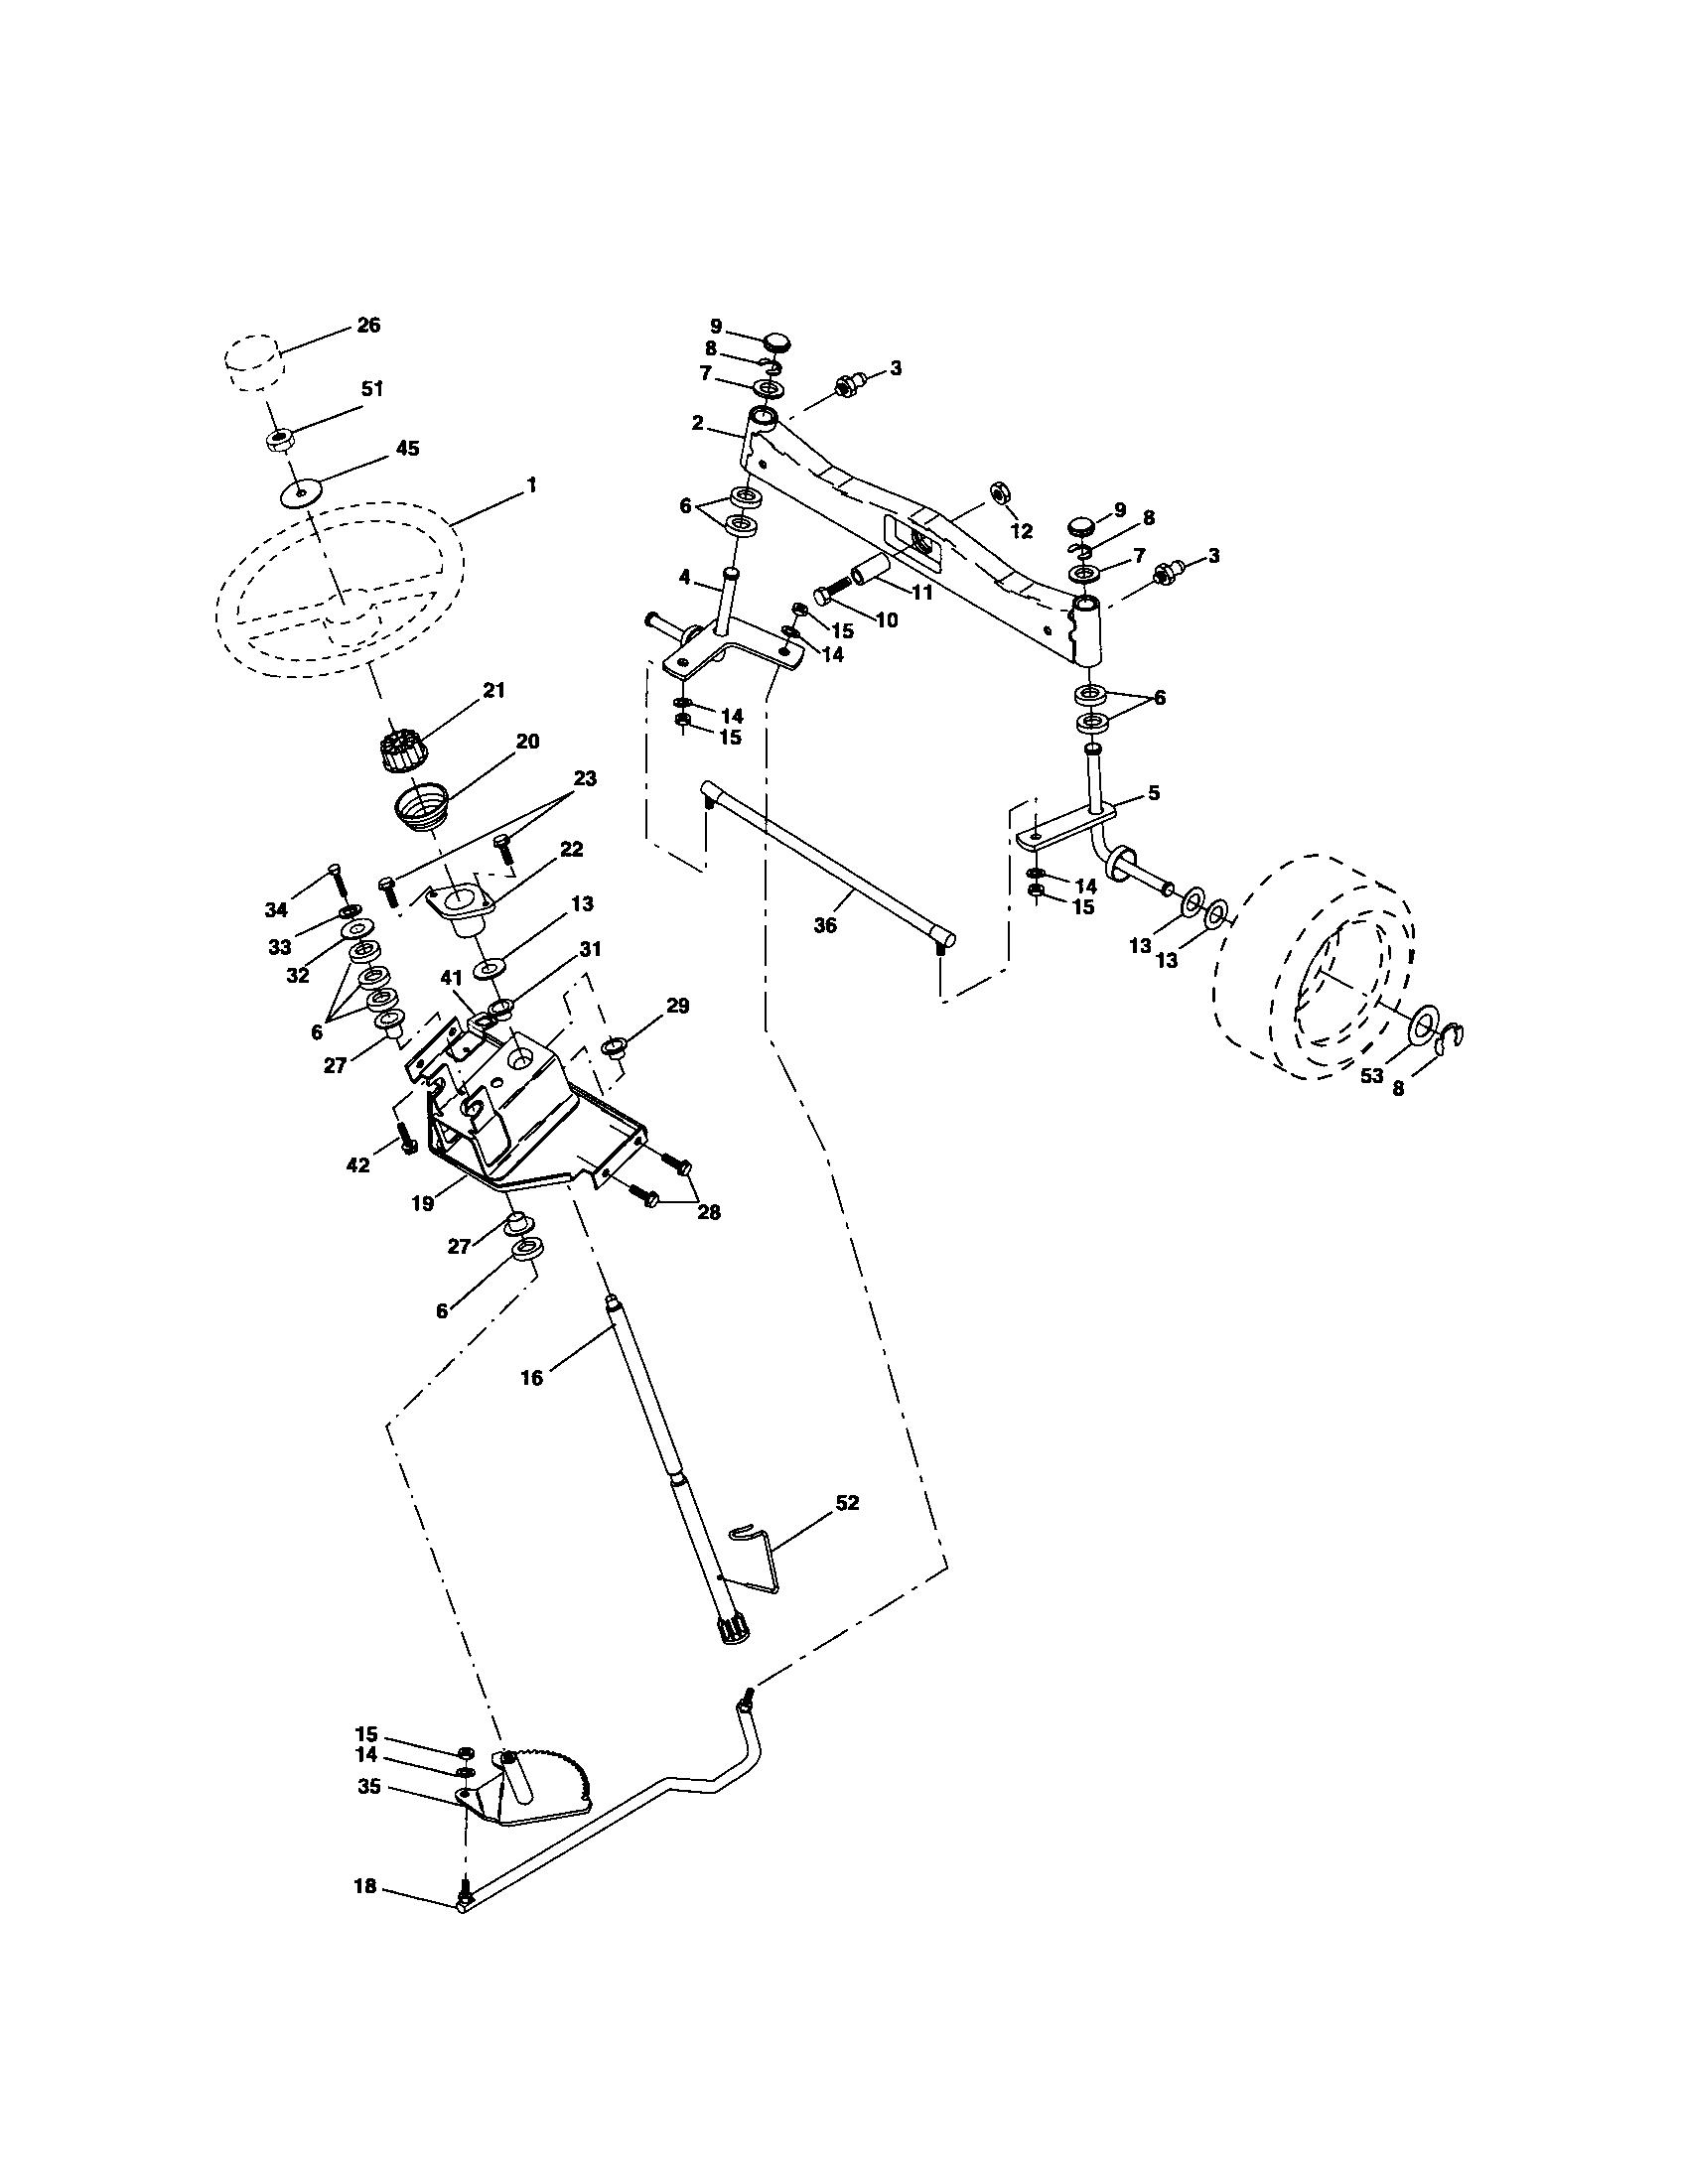 husqvarna lawn mower parts diagram wiring for goodman ac unit model logt2254 tractor genuine steering asse